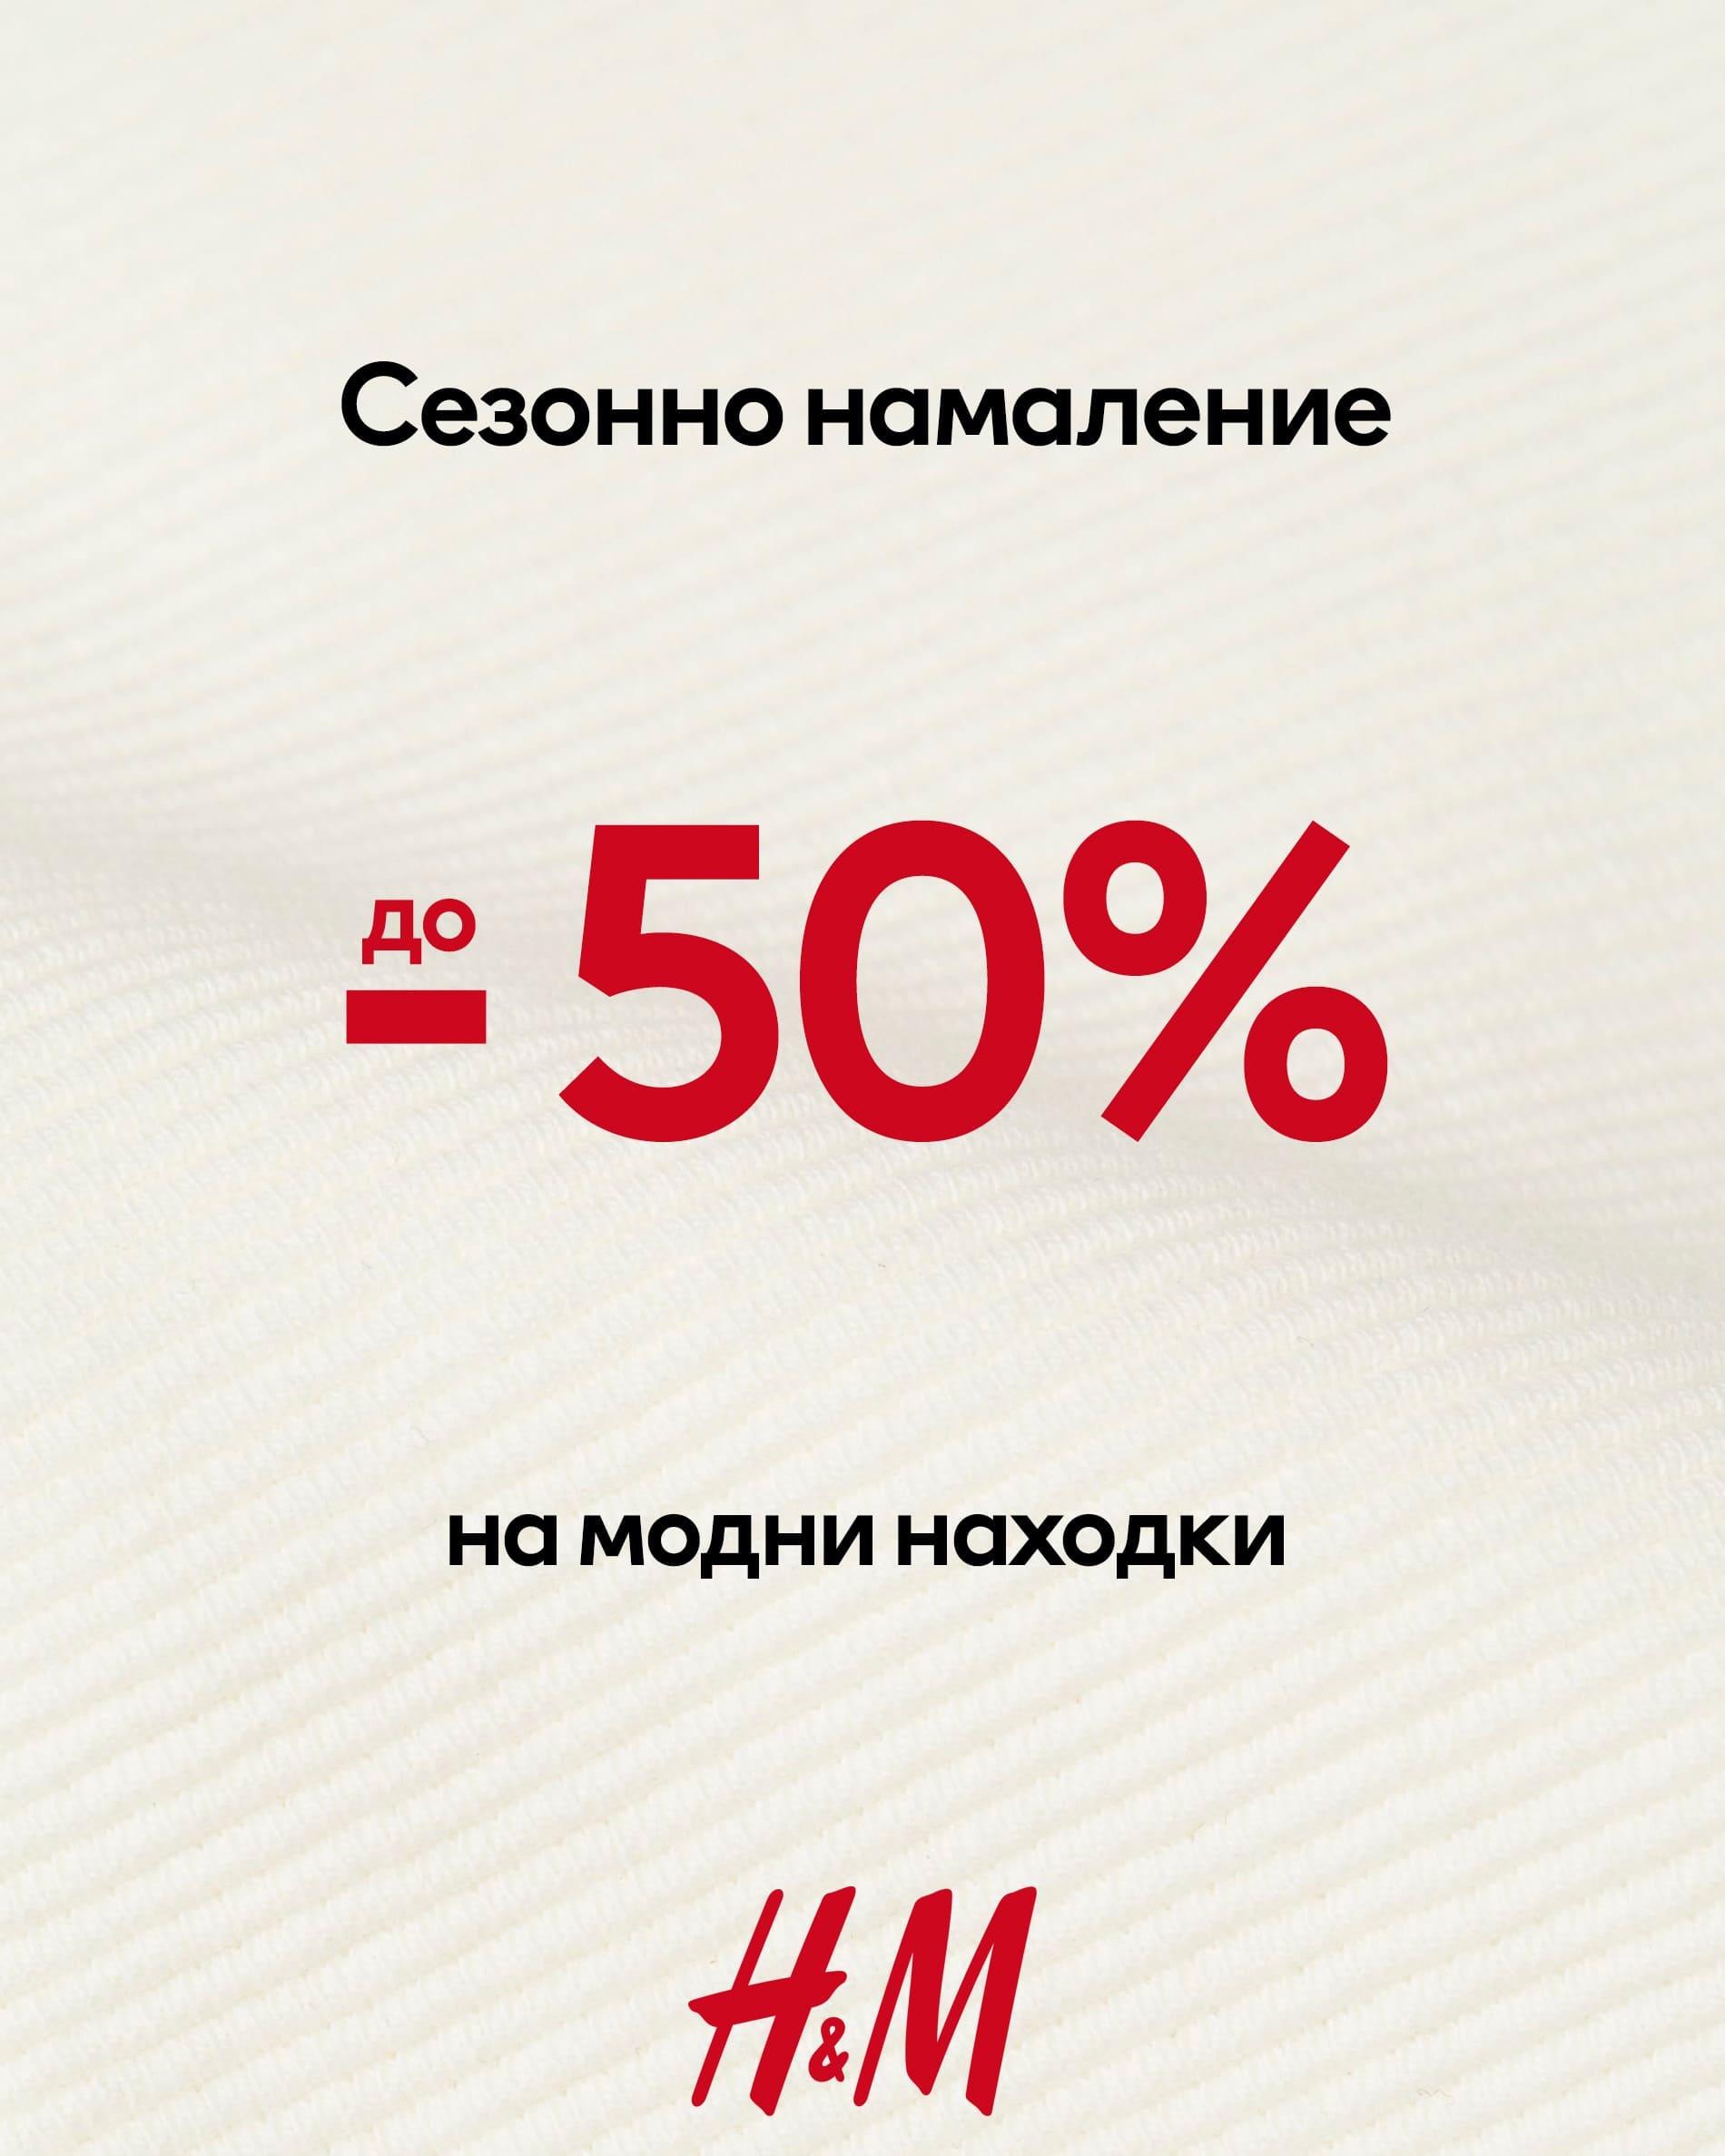 Сезонно намаление в H&M!